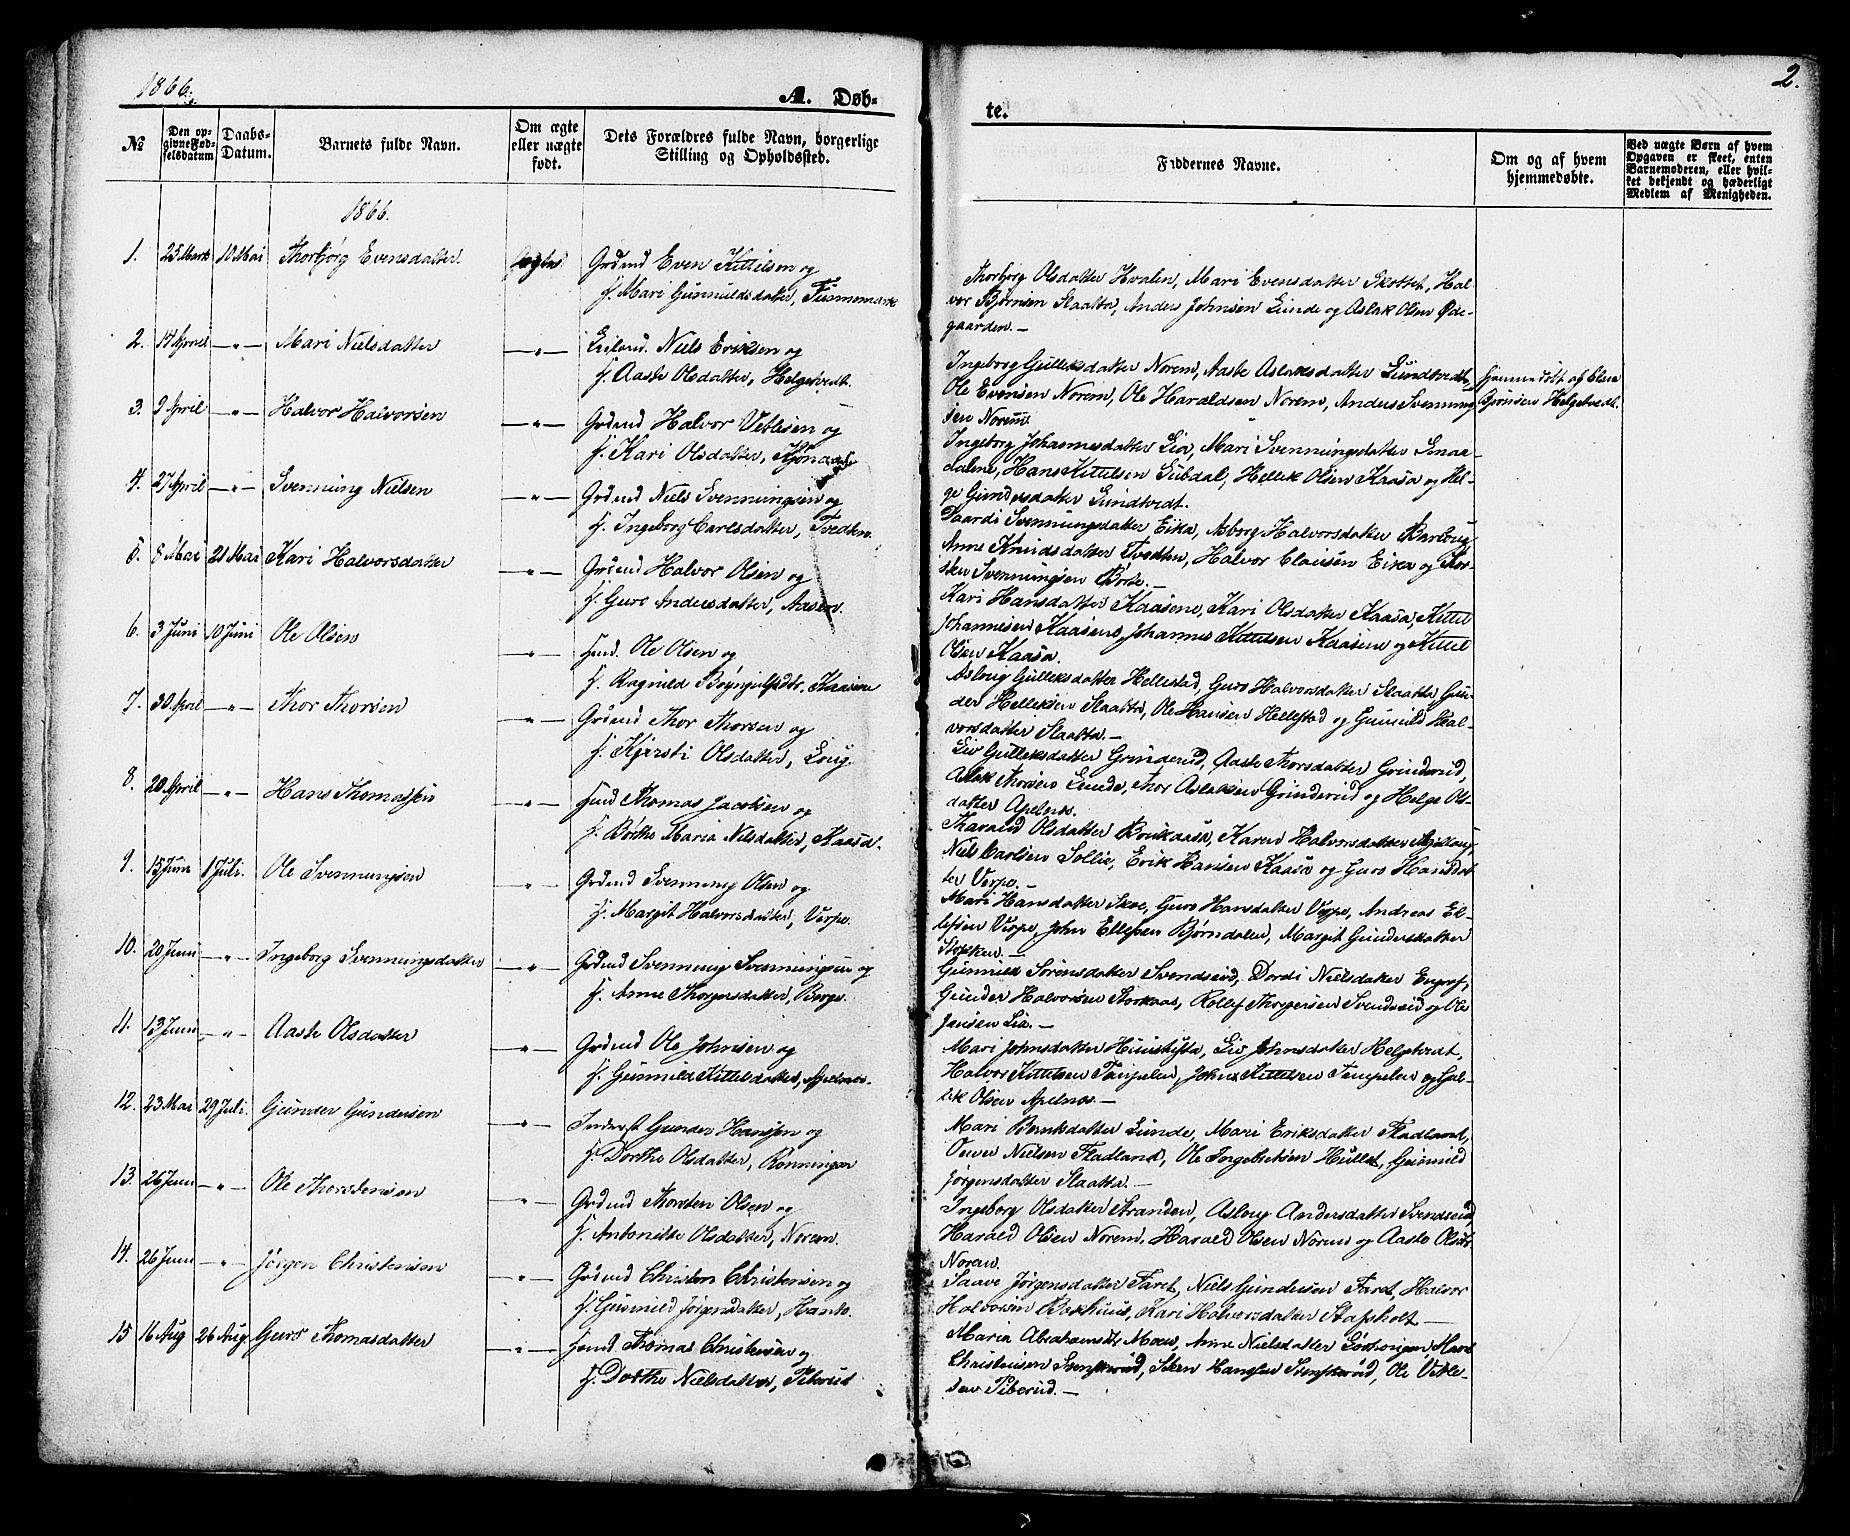 SAKO, Lunde kirkebøker, F/Fa/L0001: Ministerialbok nr. I 1, 1866-1883, s. 2